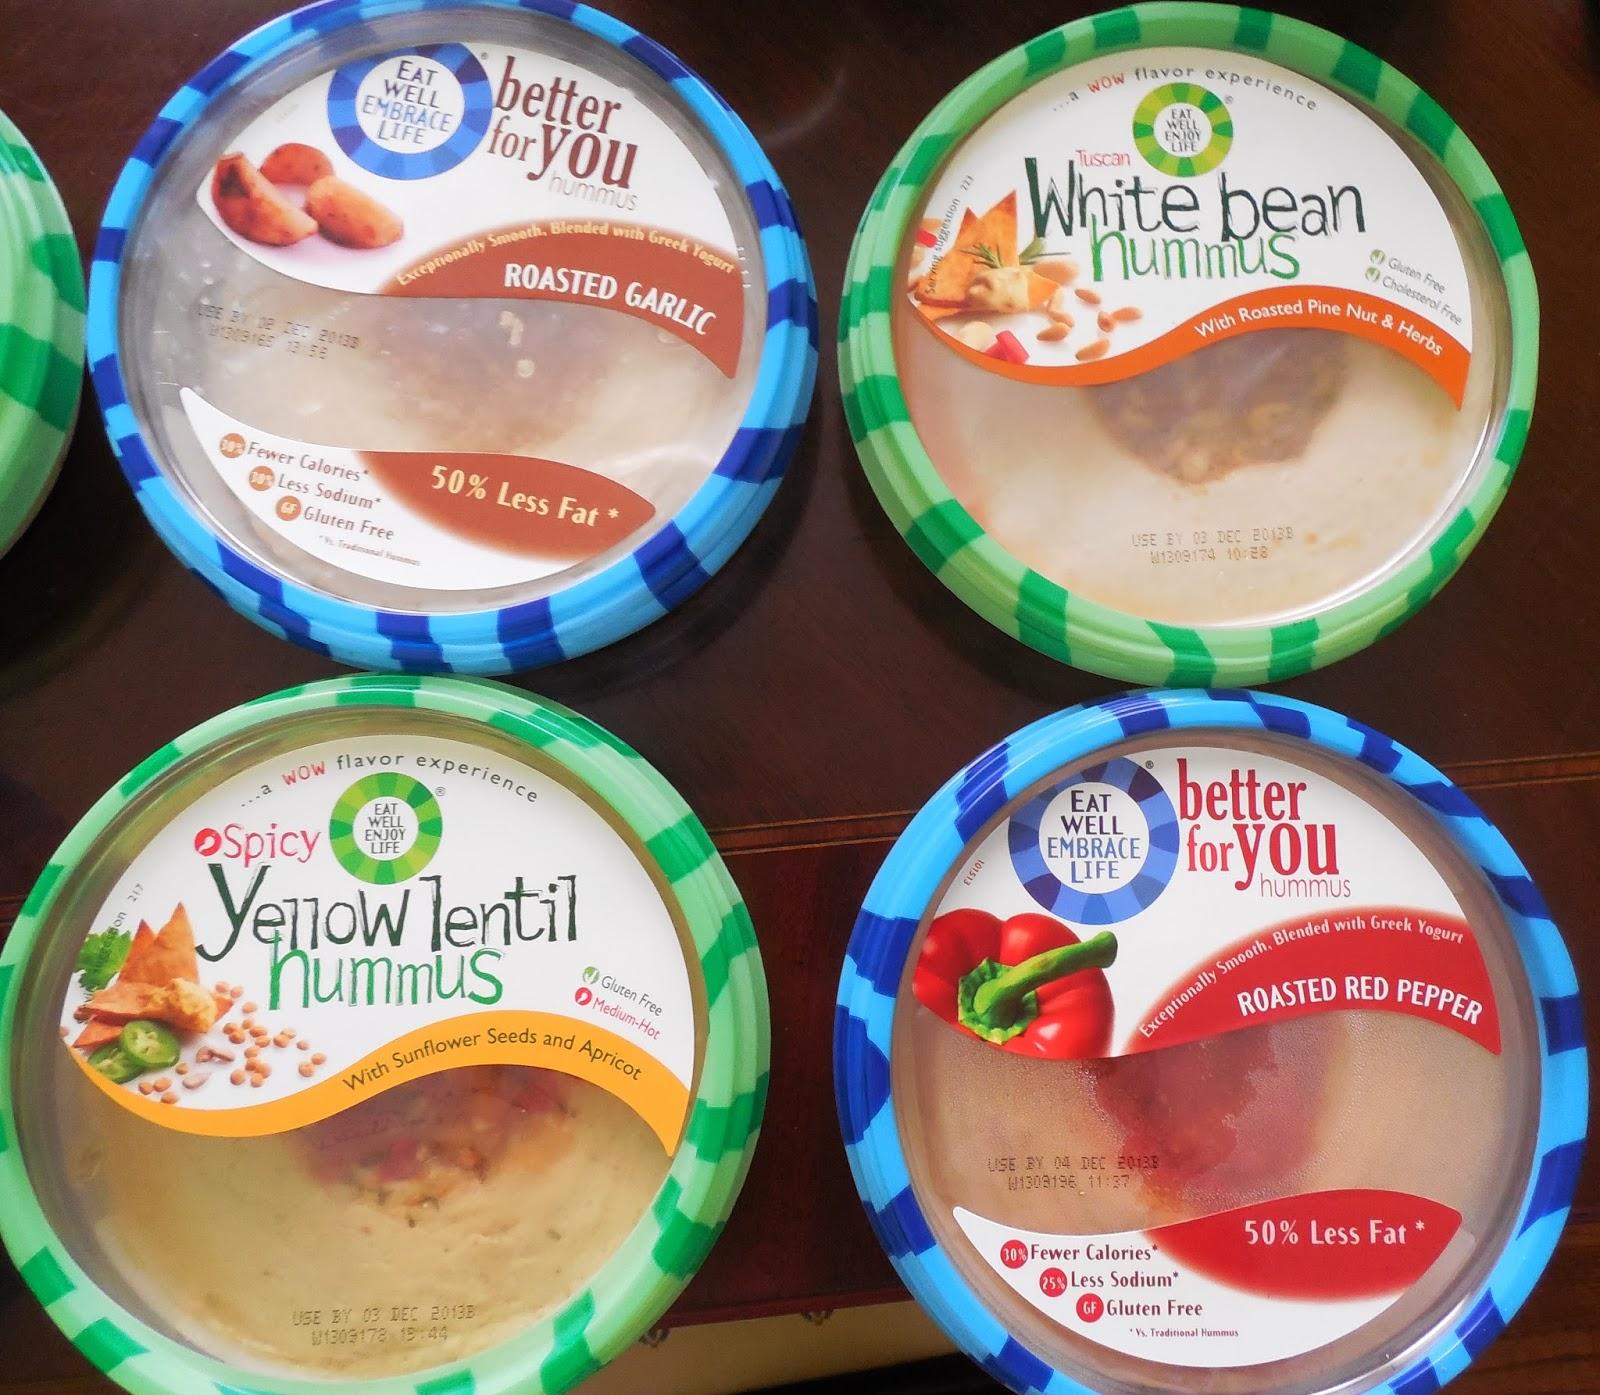 recipe: hummus mixed with greek yogurt [1]